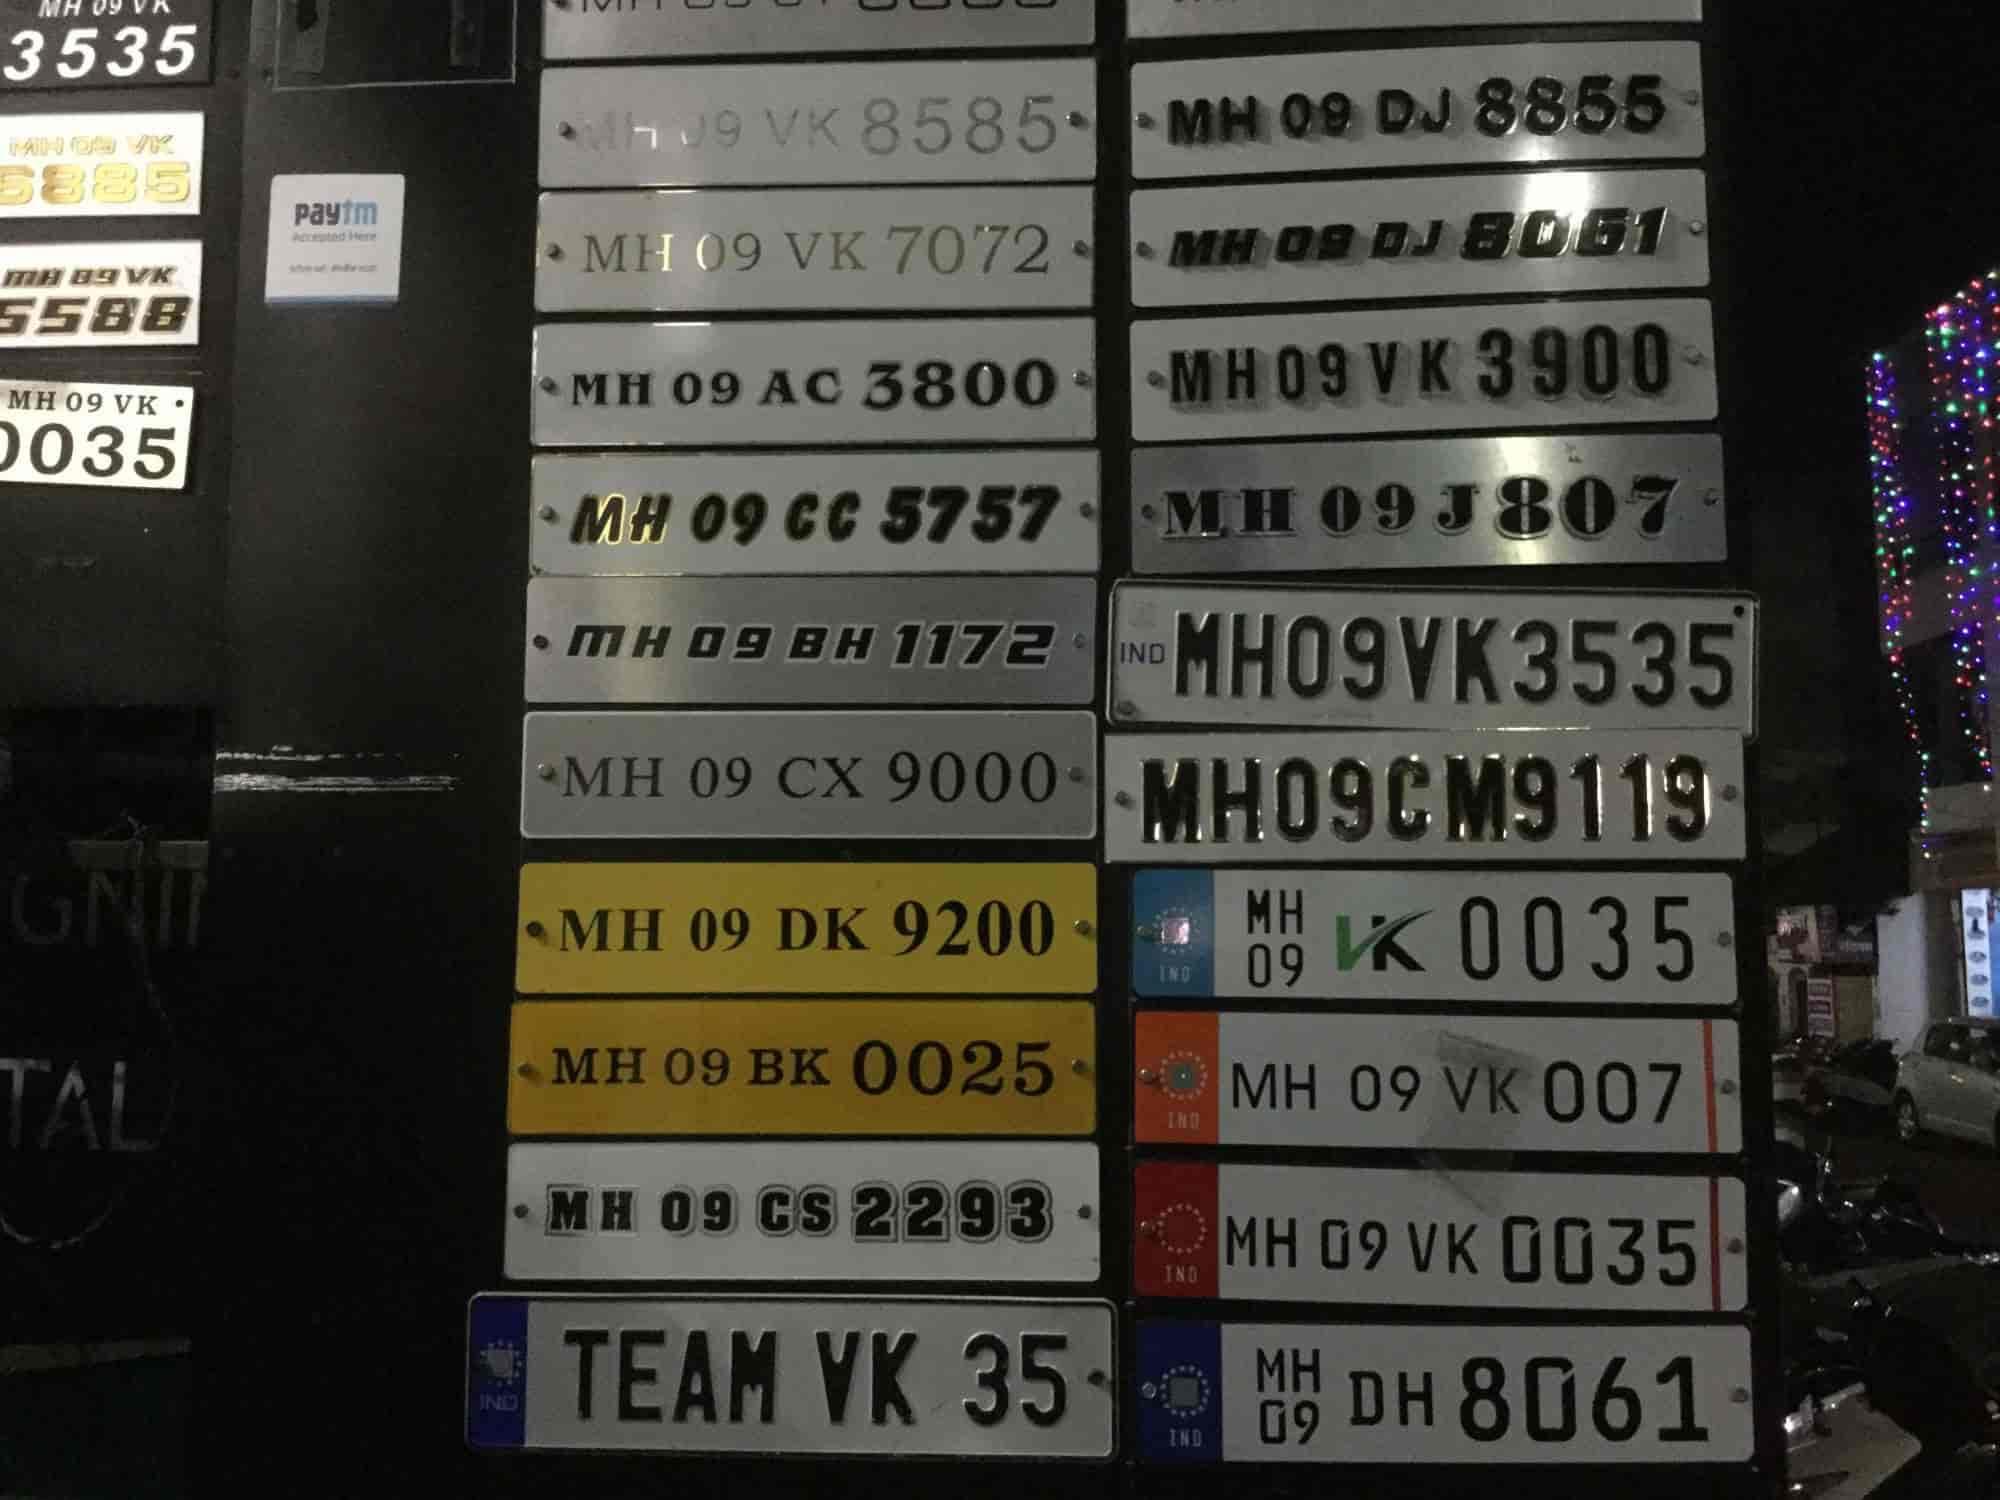 Team Vk, Shahupuri - Flex Printing Services in Kolhapur